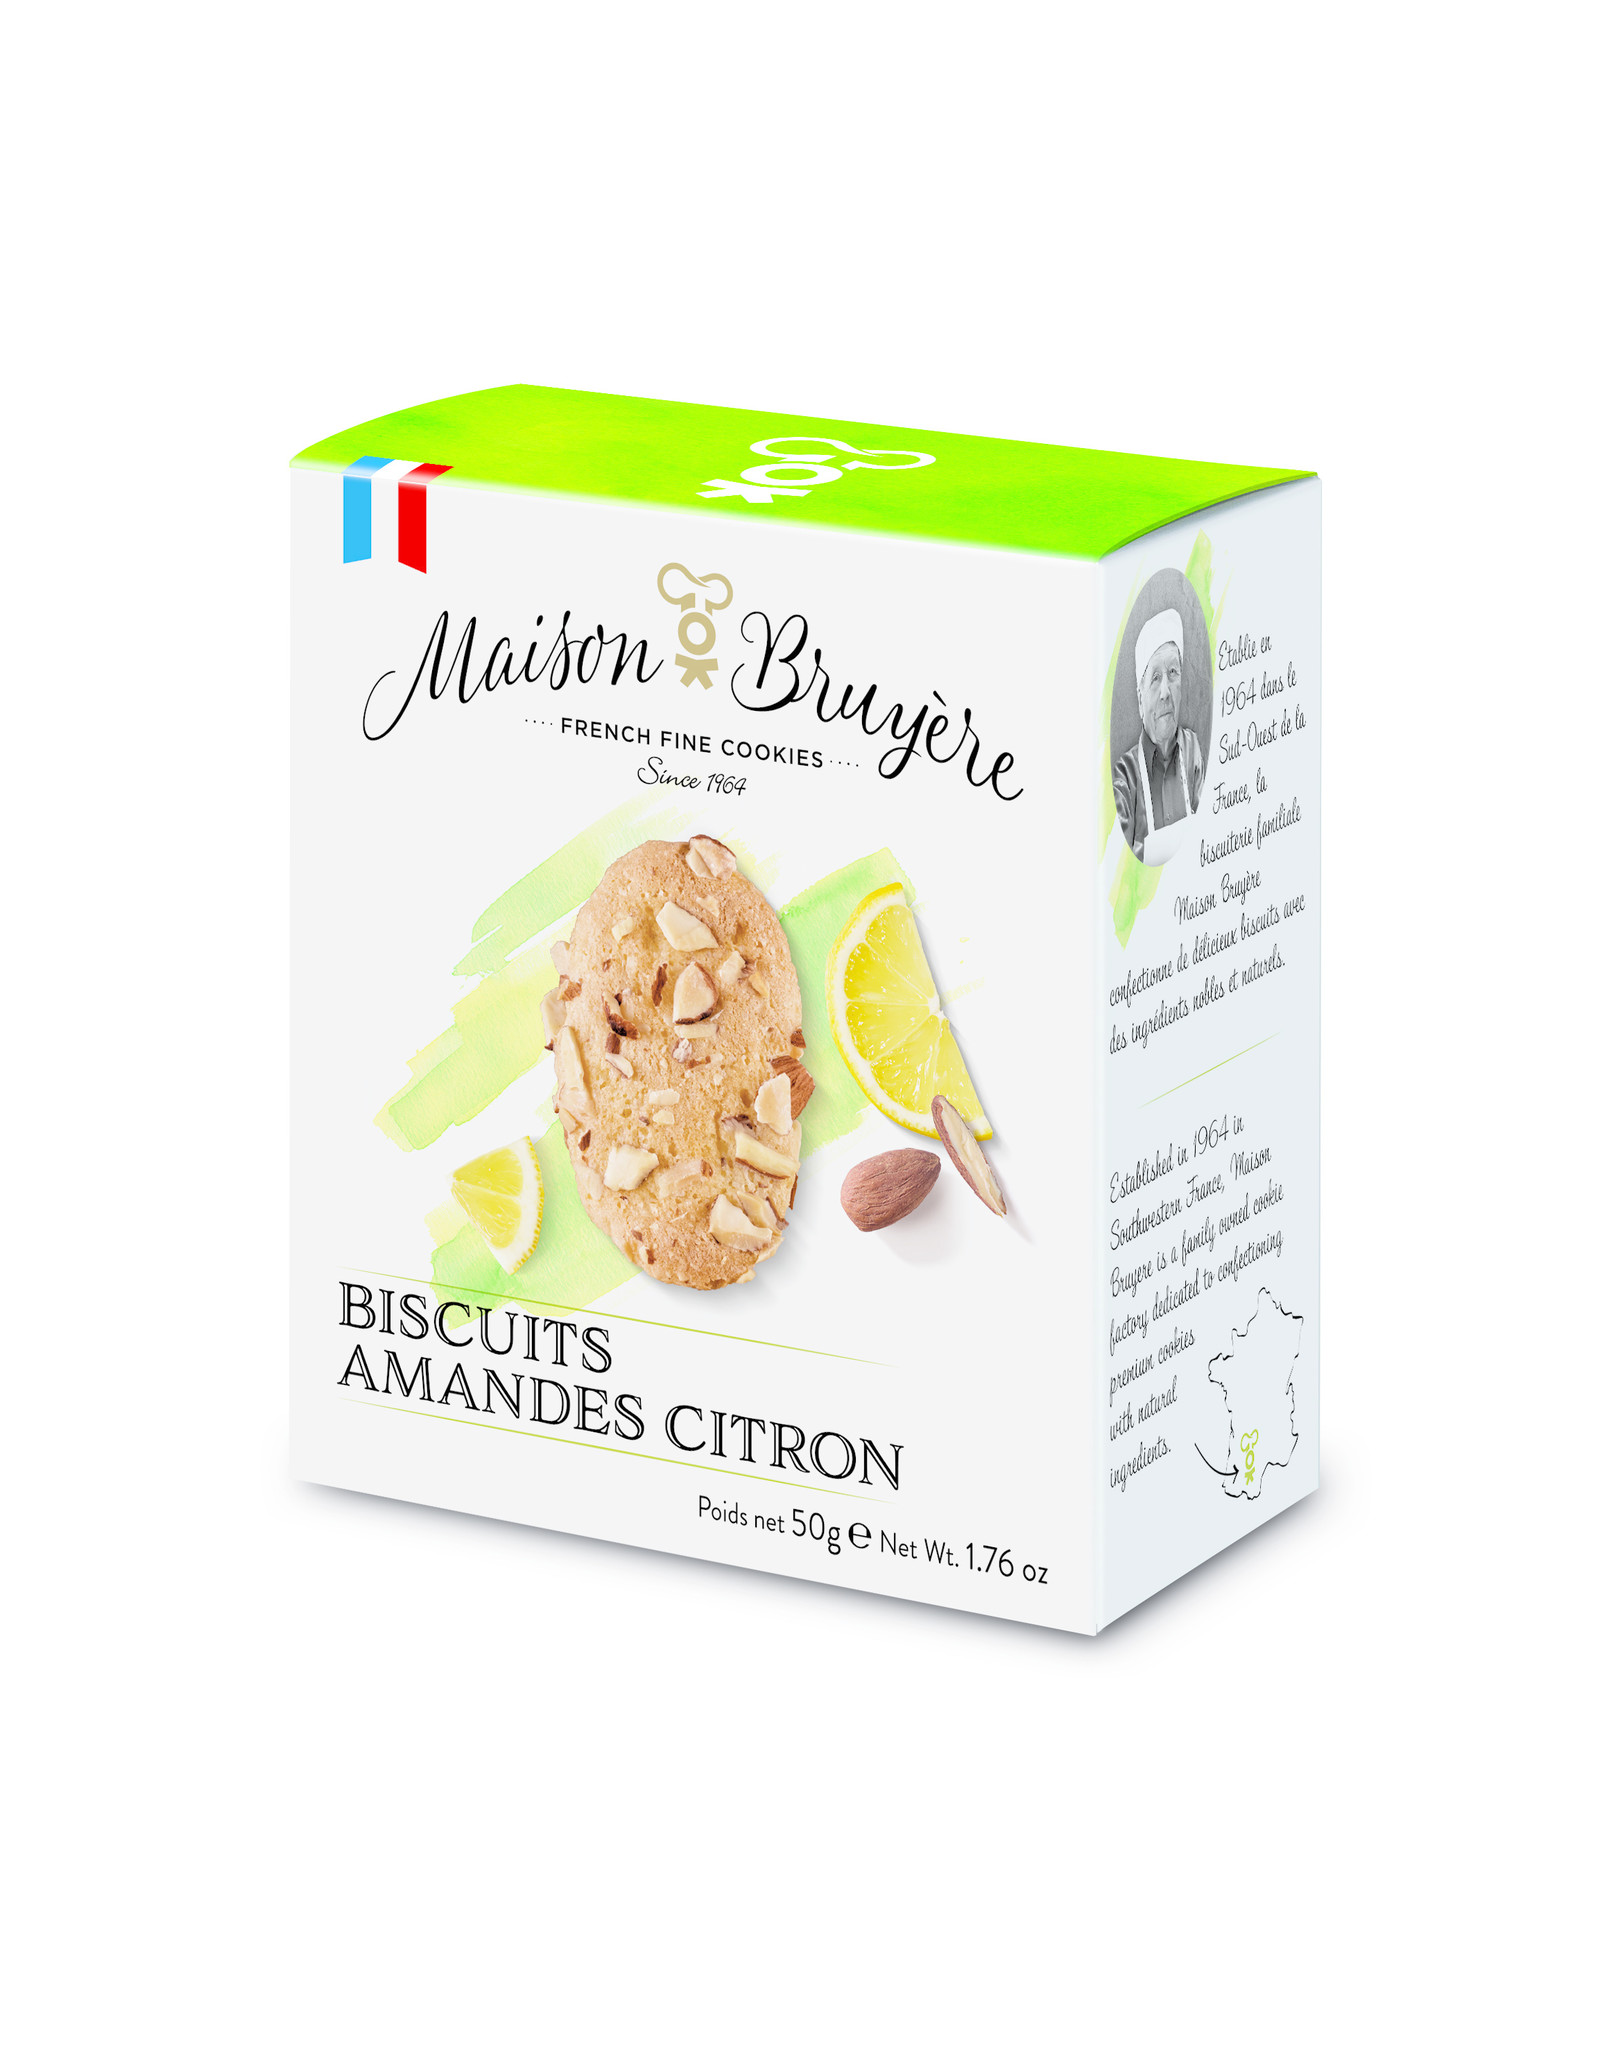 Maison Bruyere Almond lemon cookies 50g